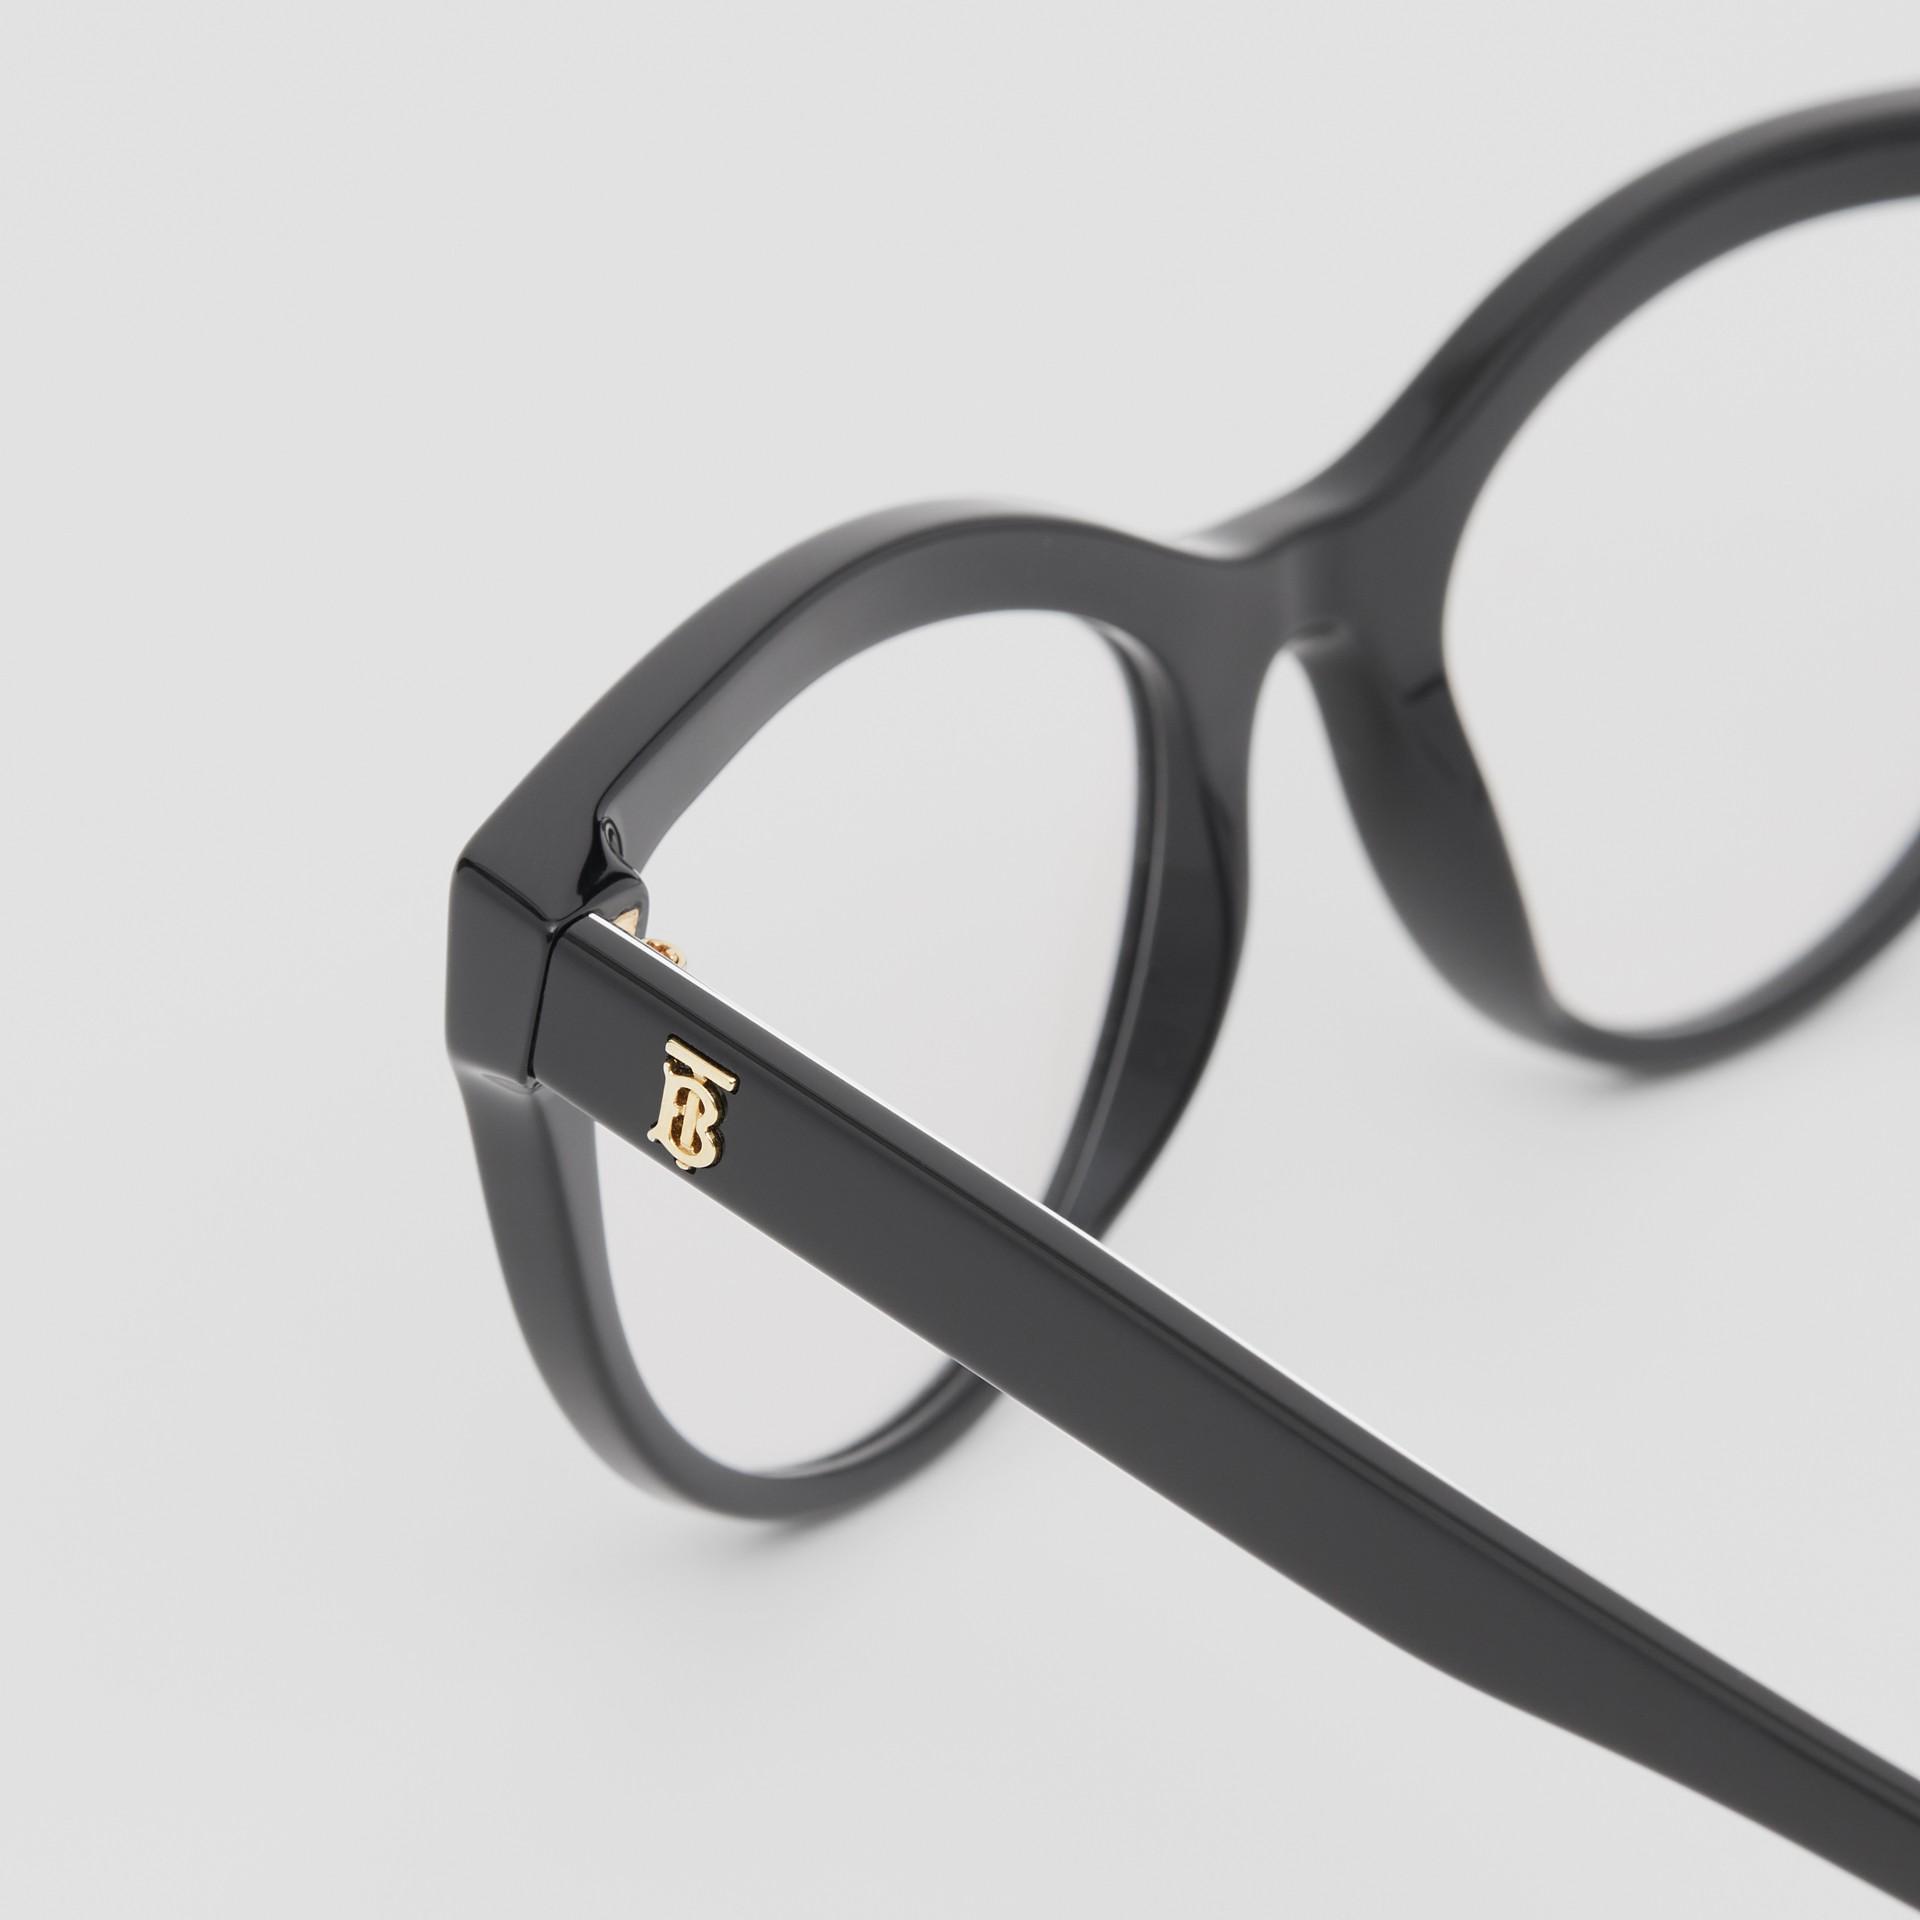 Monogram Print Detail Cat-eye Optical Frames in Black/vermilion - Women | Burberry Canada - gallery image 1